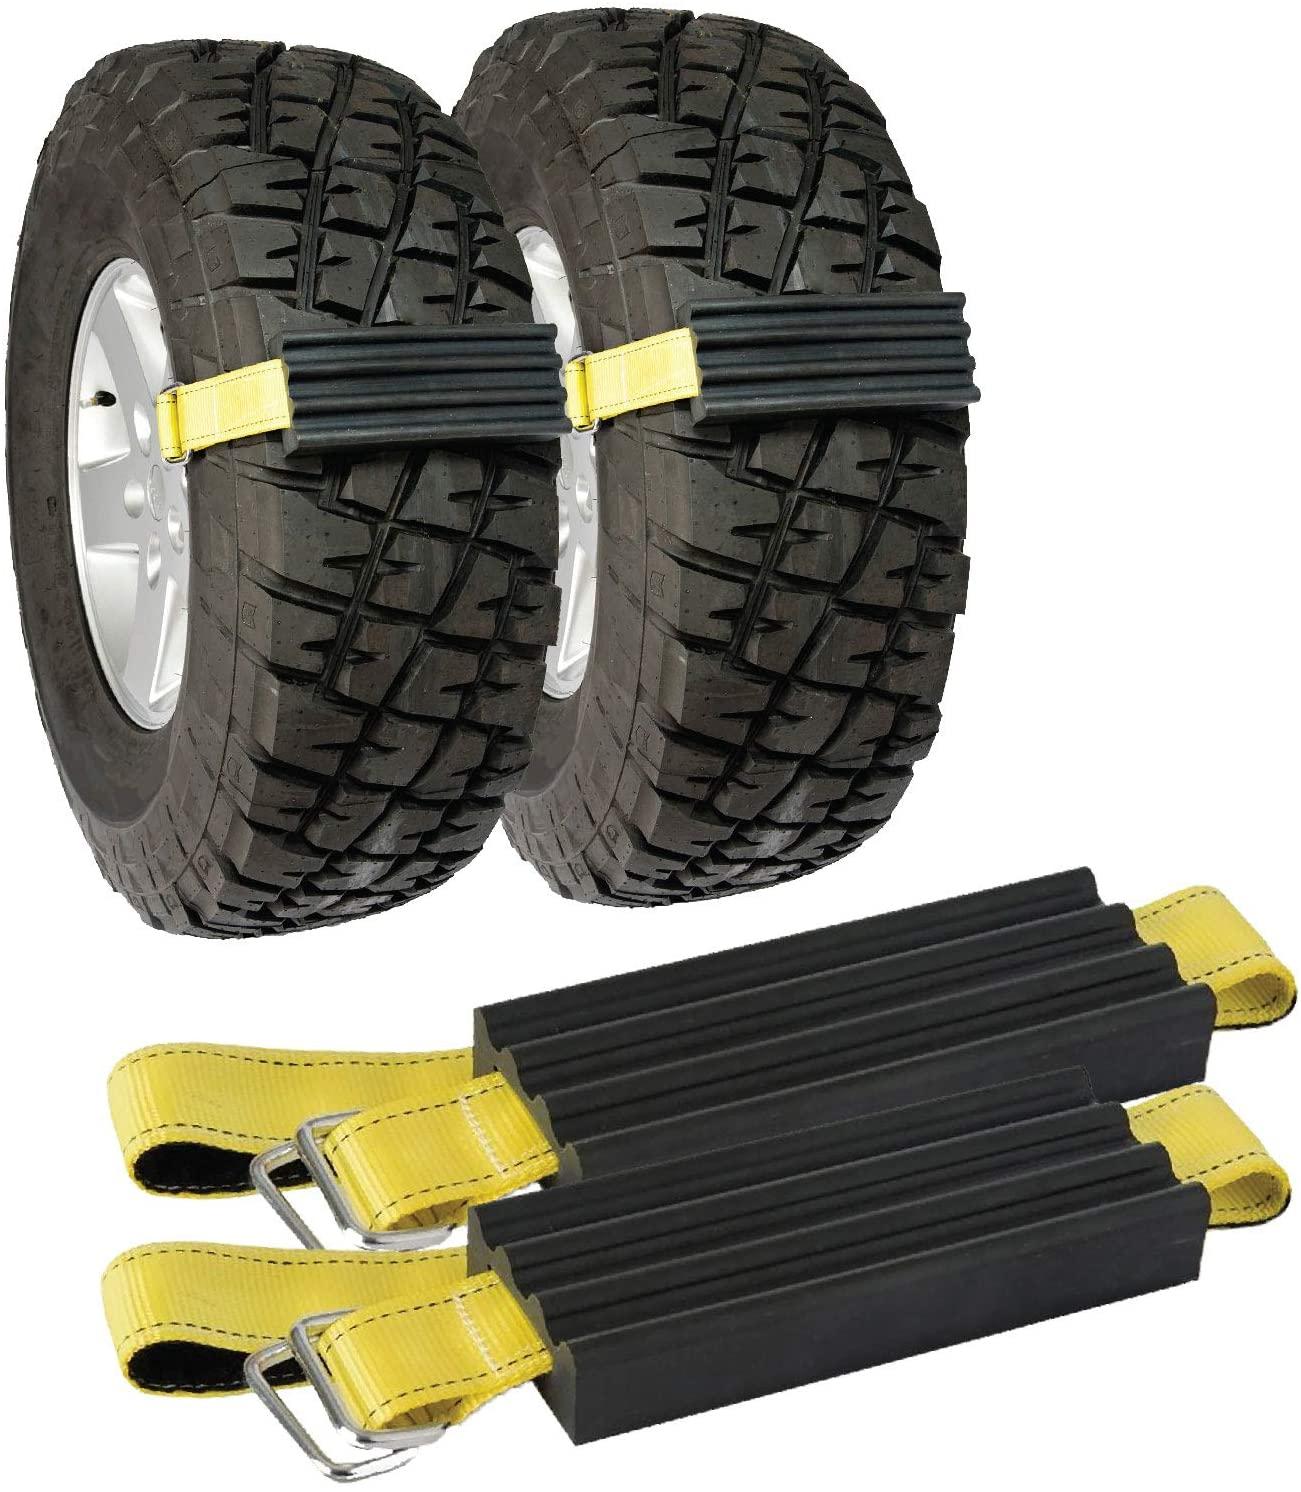 XINQI 6pcs Adjustable Winter Universal Fix Car Tire Emergency Anti Slip Snow Tire Chains for Most Cars/SUV/Trucks